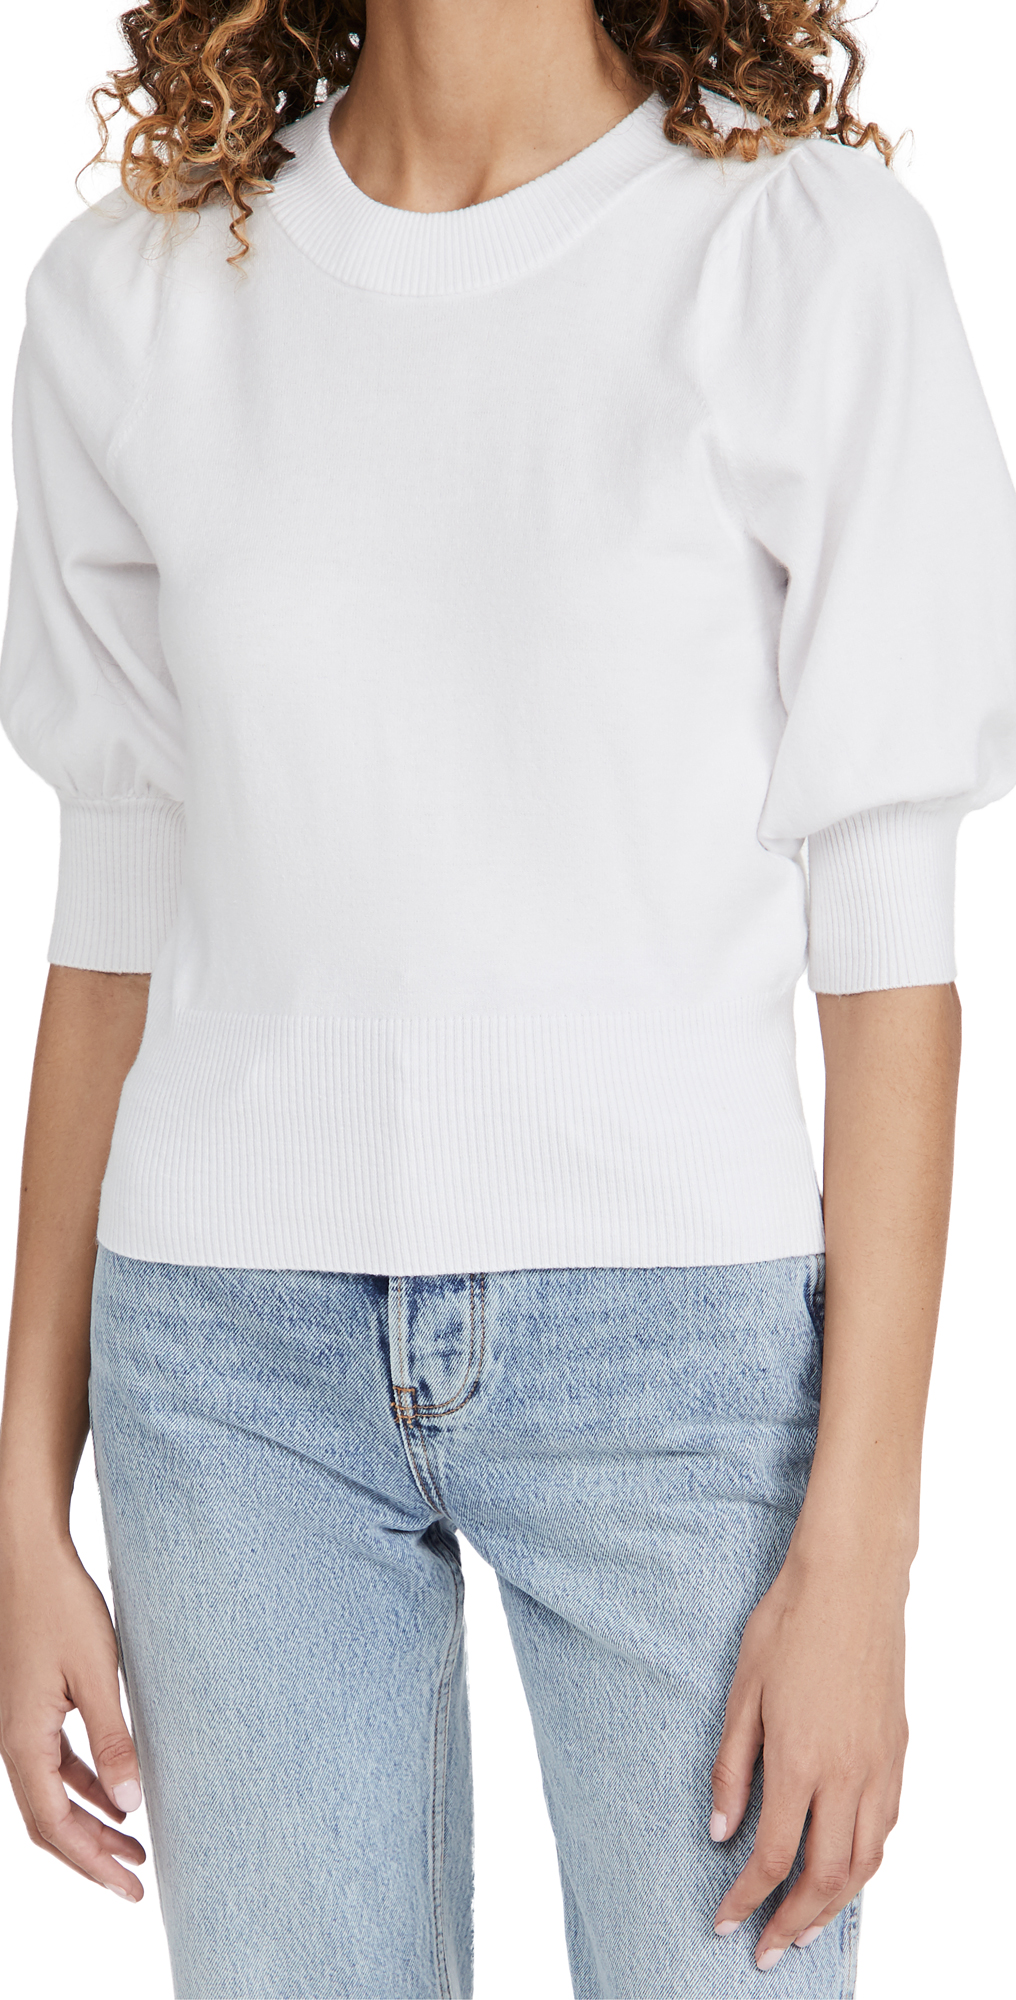 BB Dakota Girl Neck Door Puff Sleeve Sweater